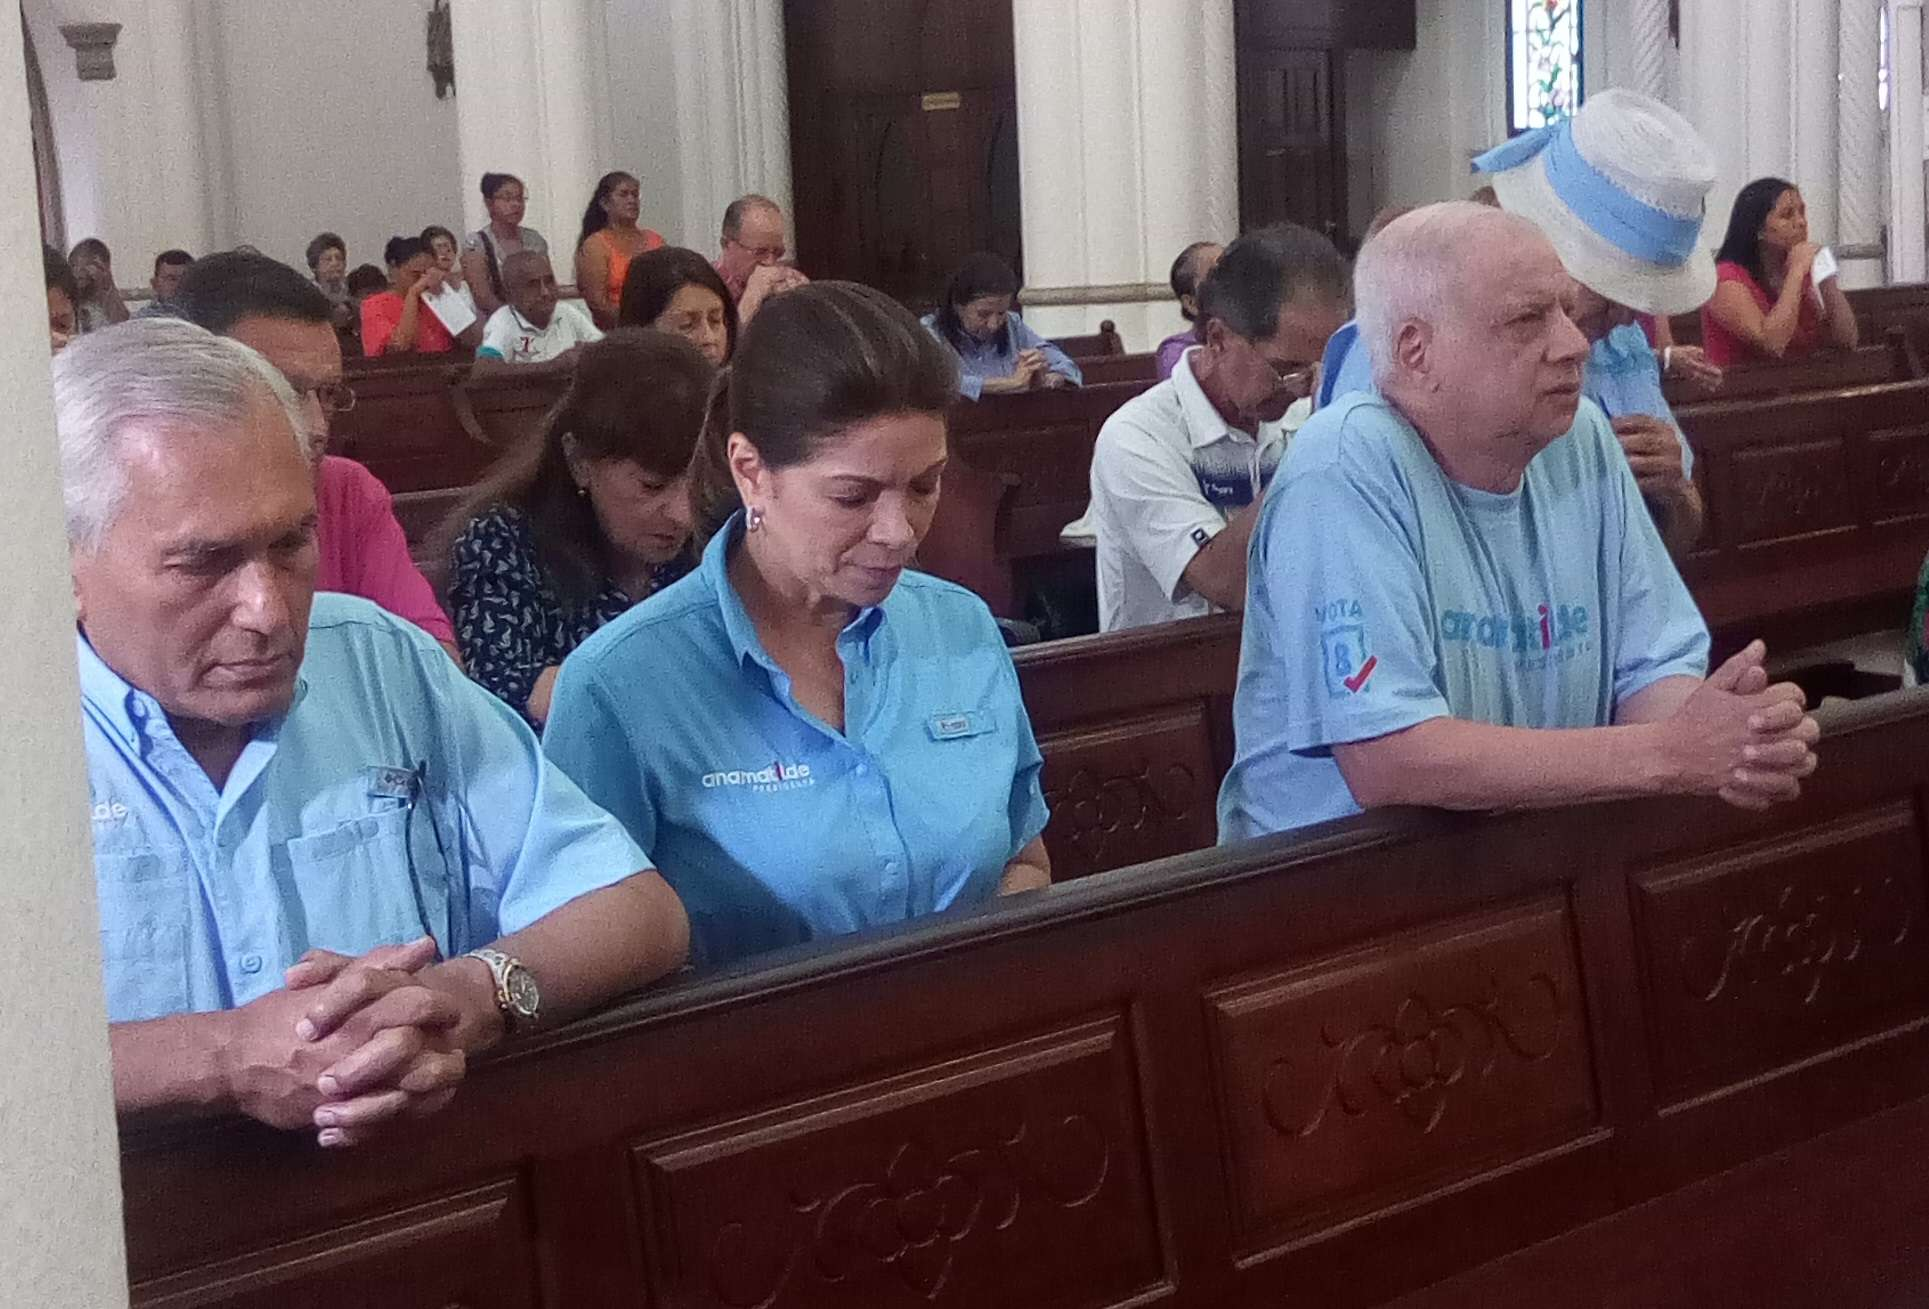 La candidata Ana Matilde Gómez en la Iglesia del Carmen. /Fotos: Maricarmen Camargo